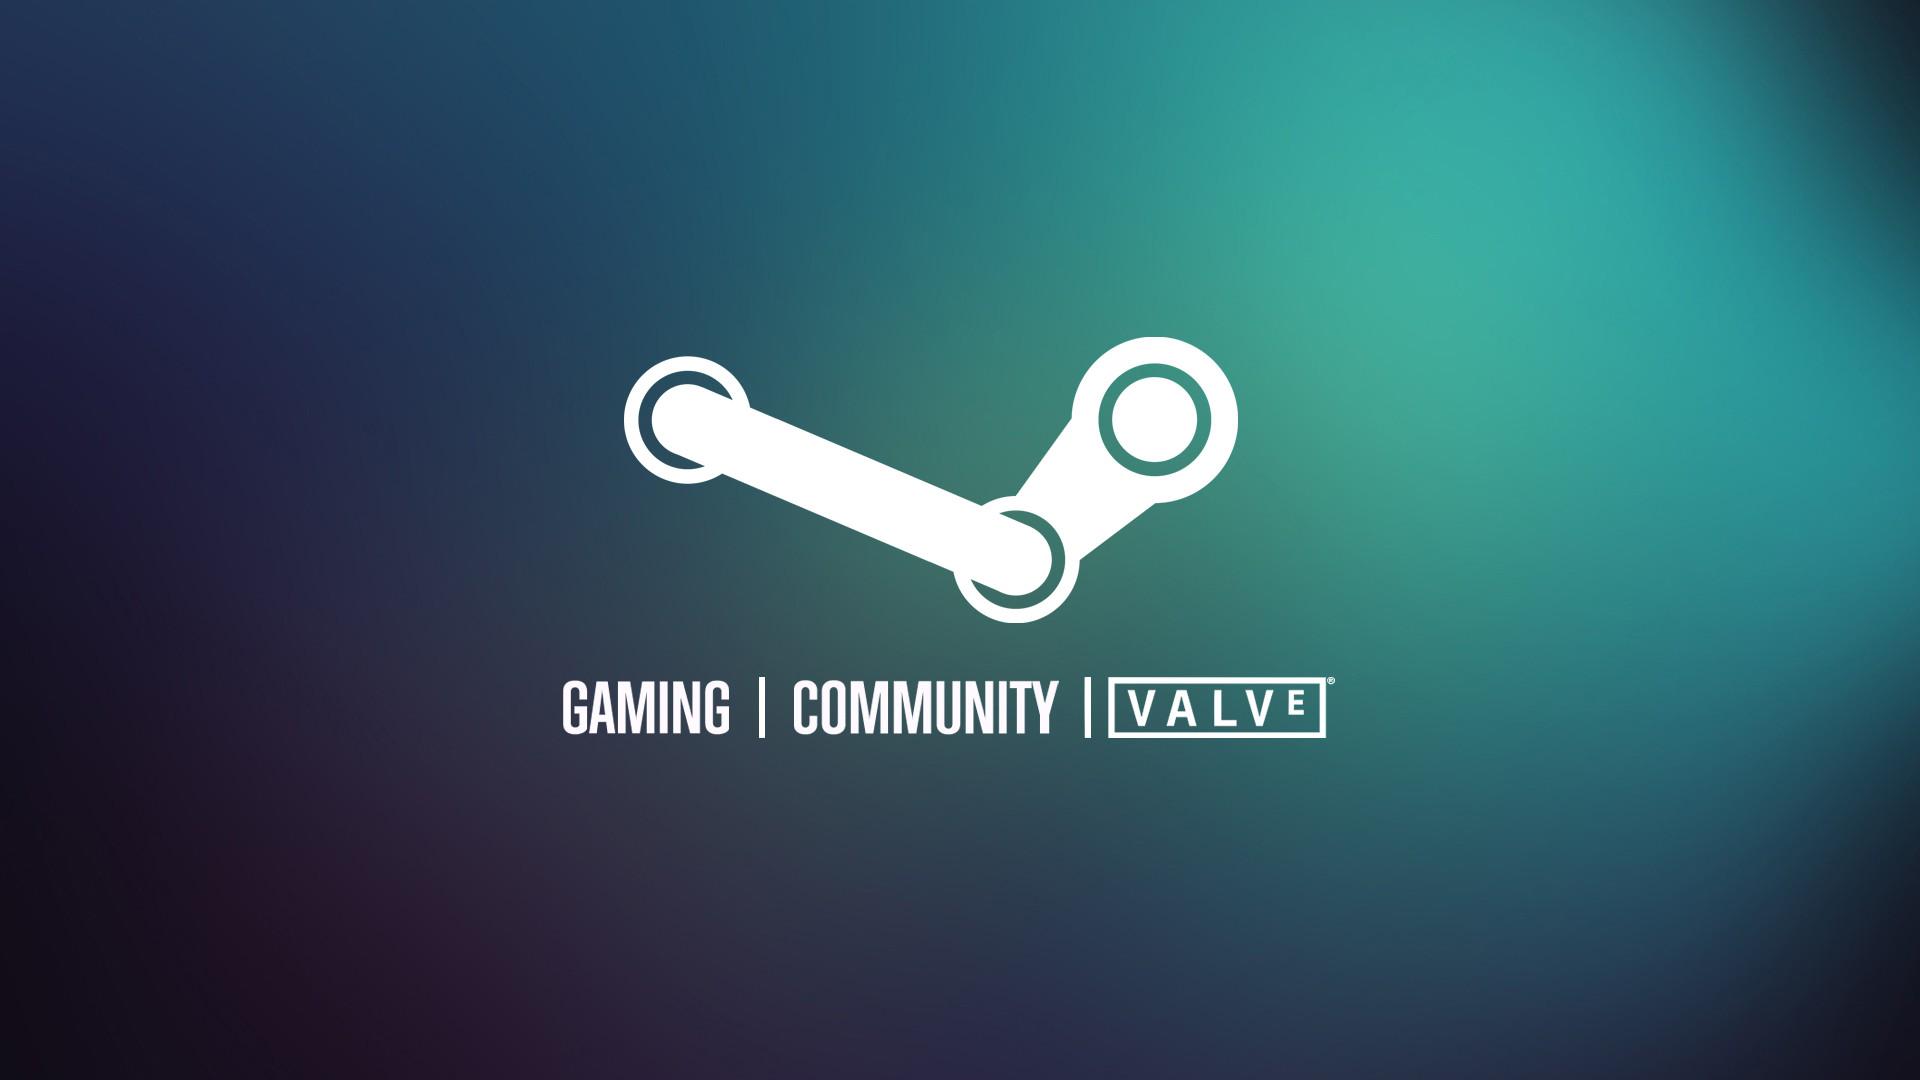 png corsair gaming backgrounds